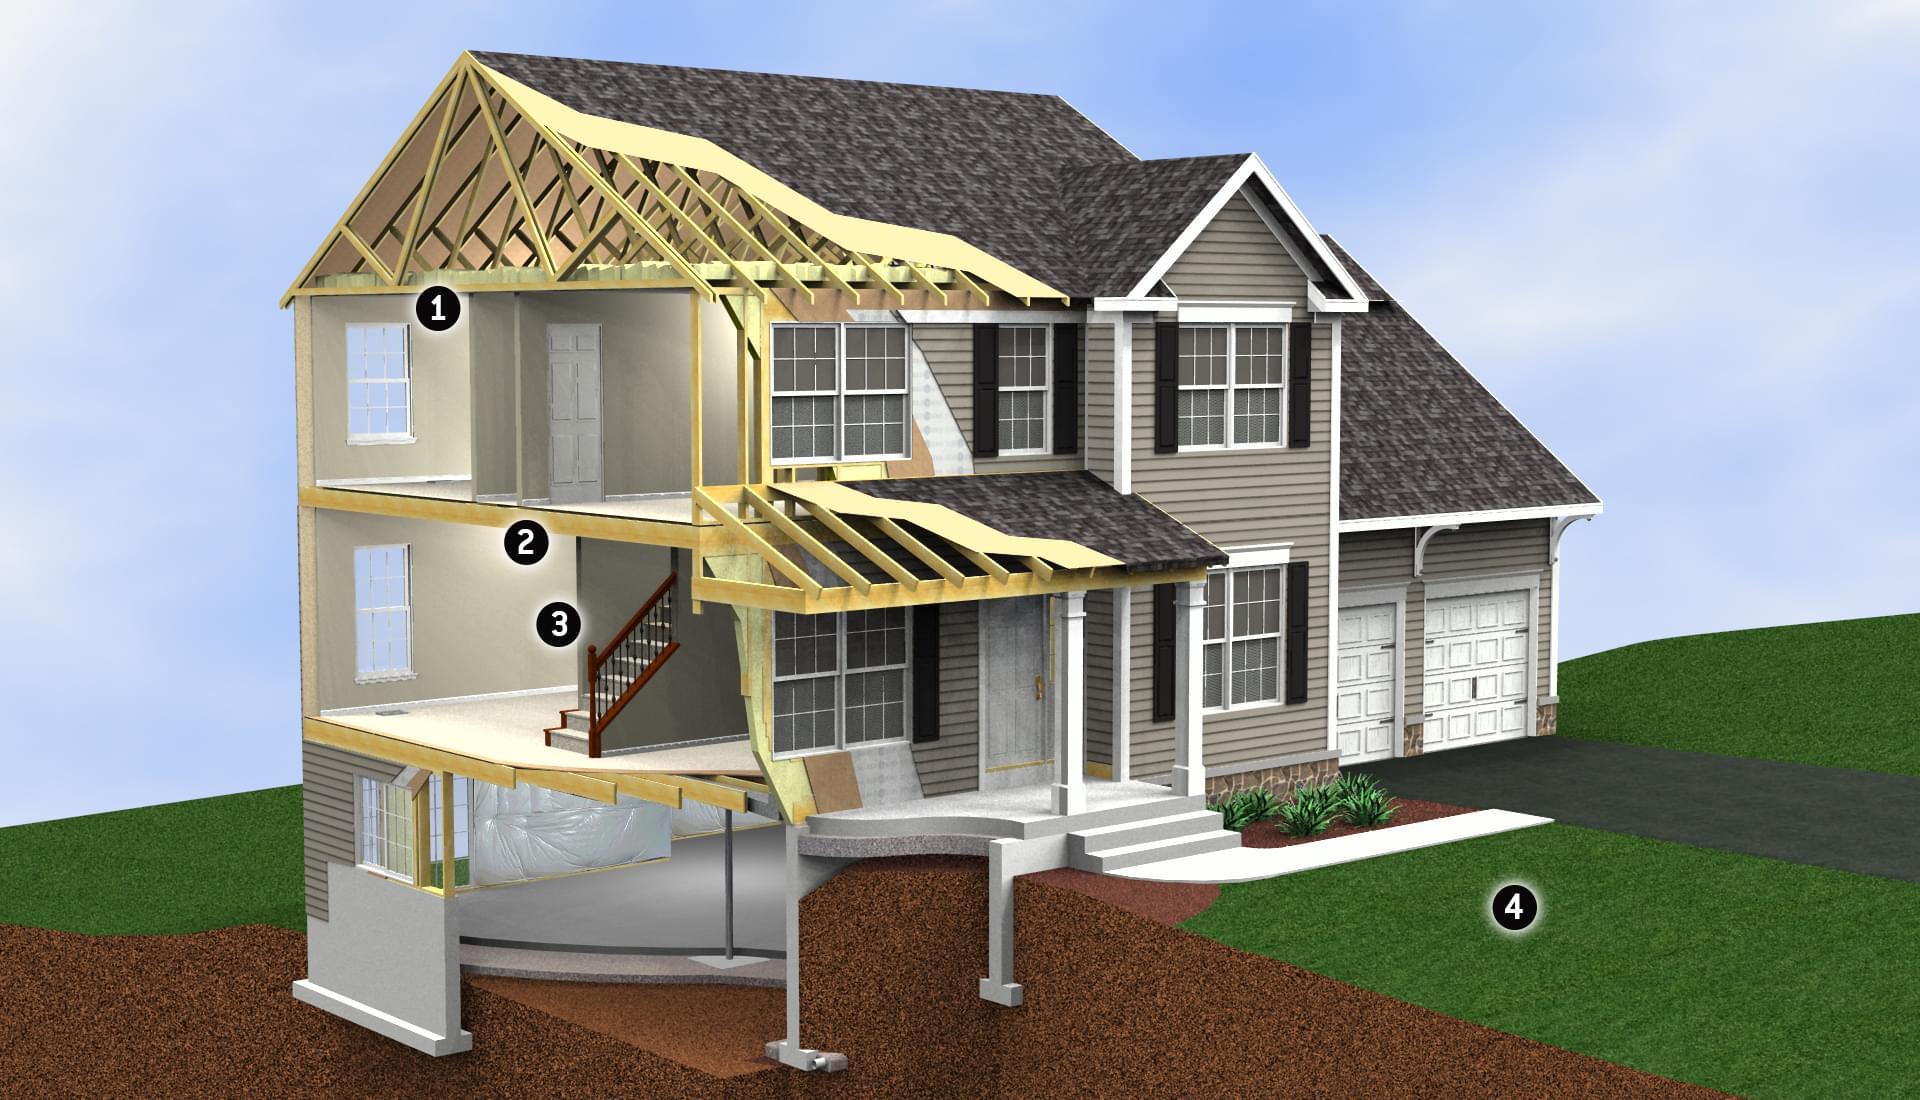 Berks Homes Smart Build - SB Finishing